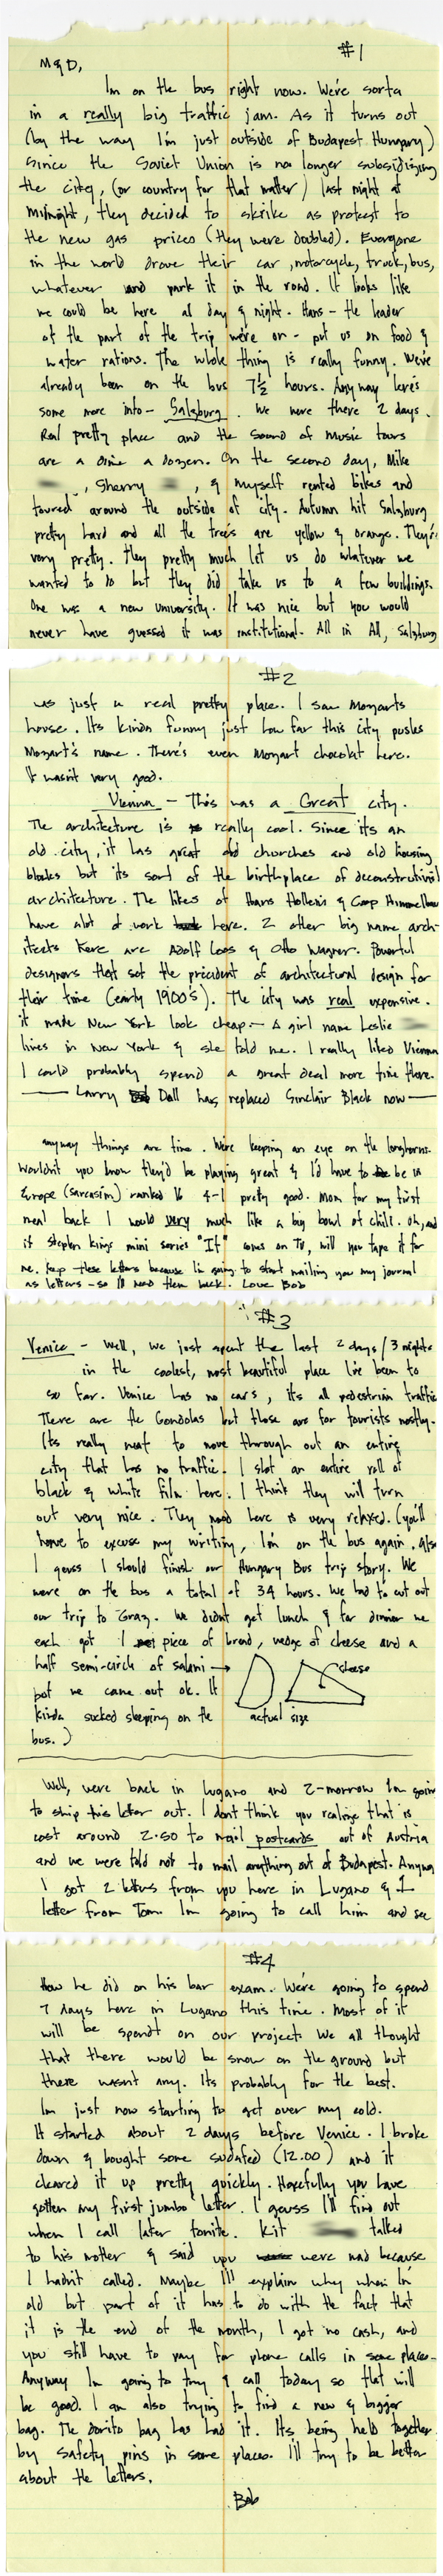 Bob Borson letter from Europe